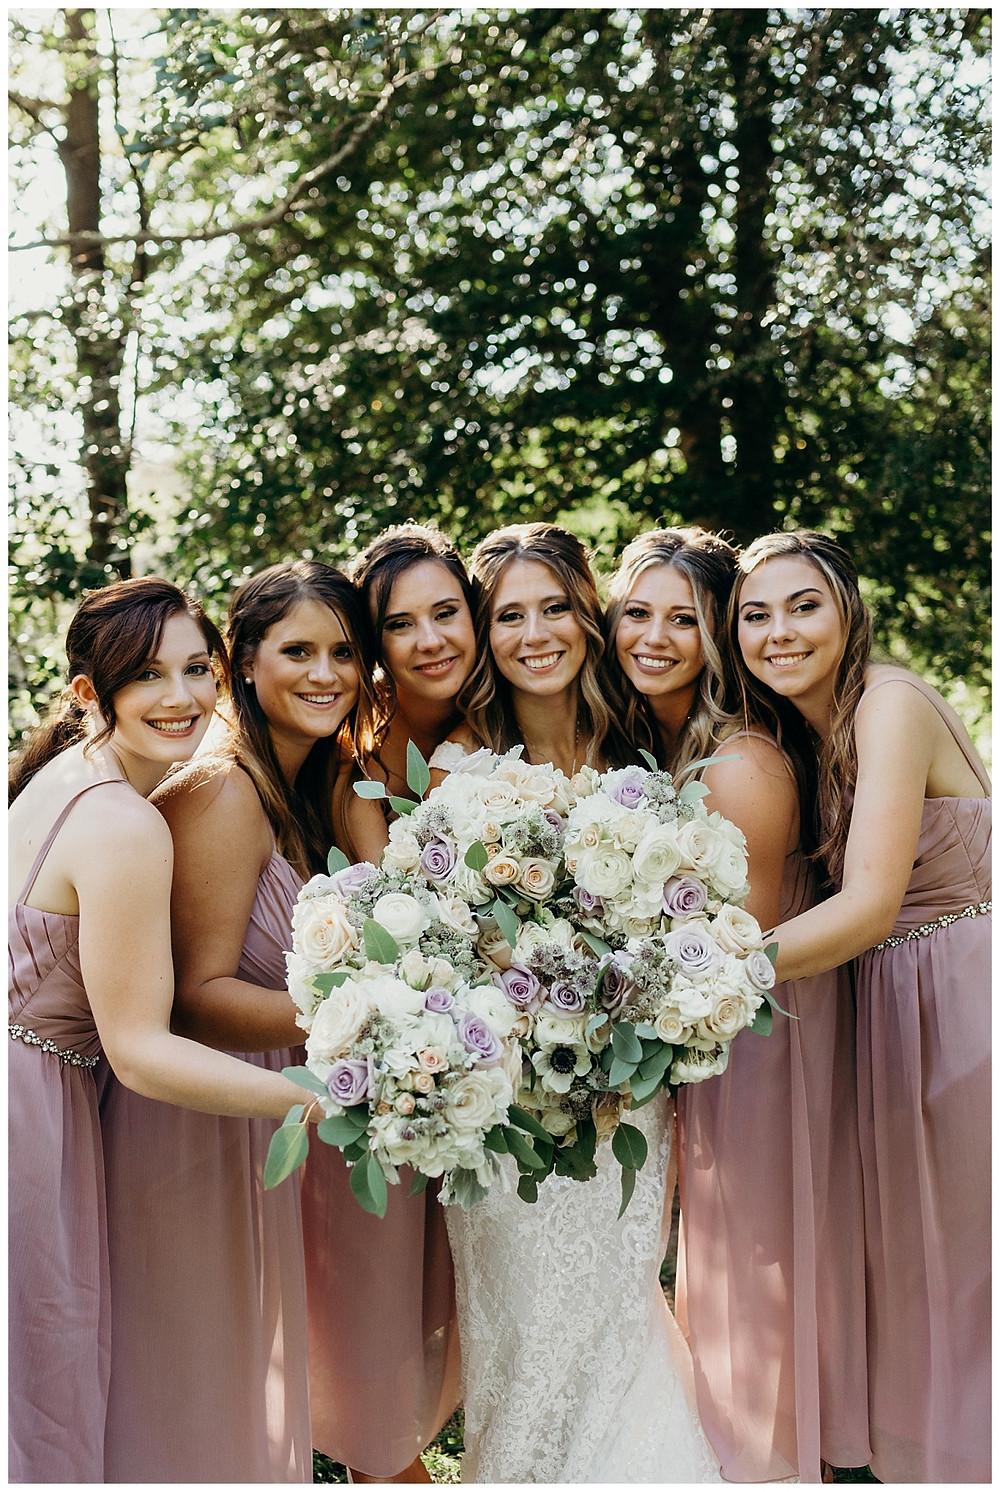 Bride & Bridesamaids